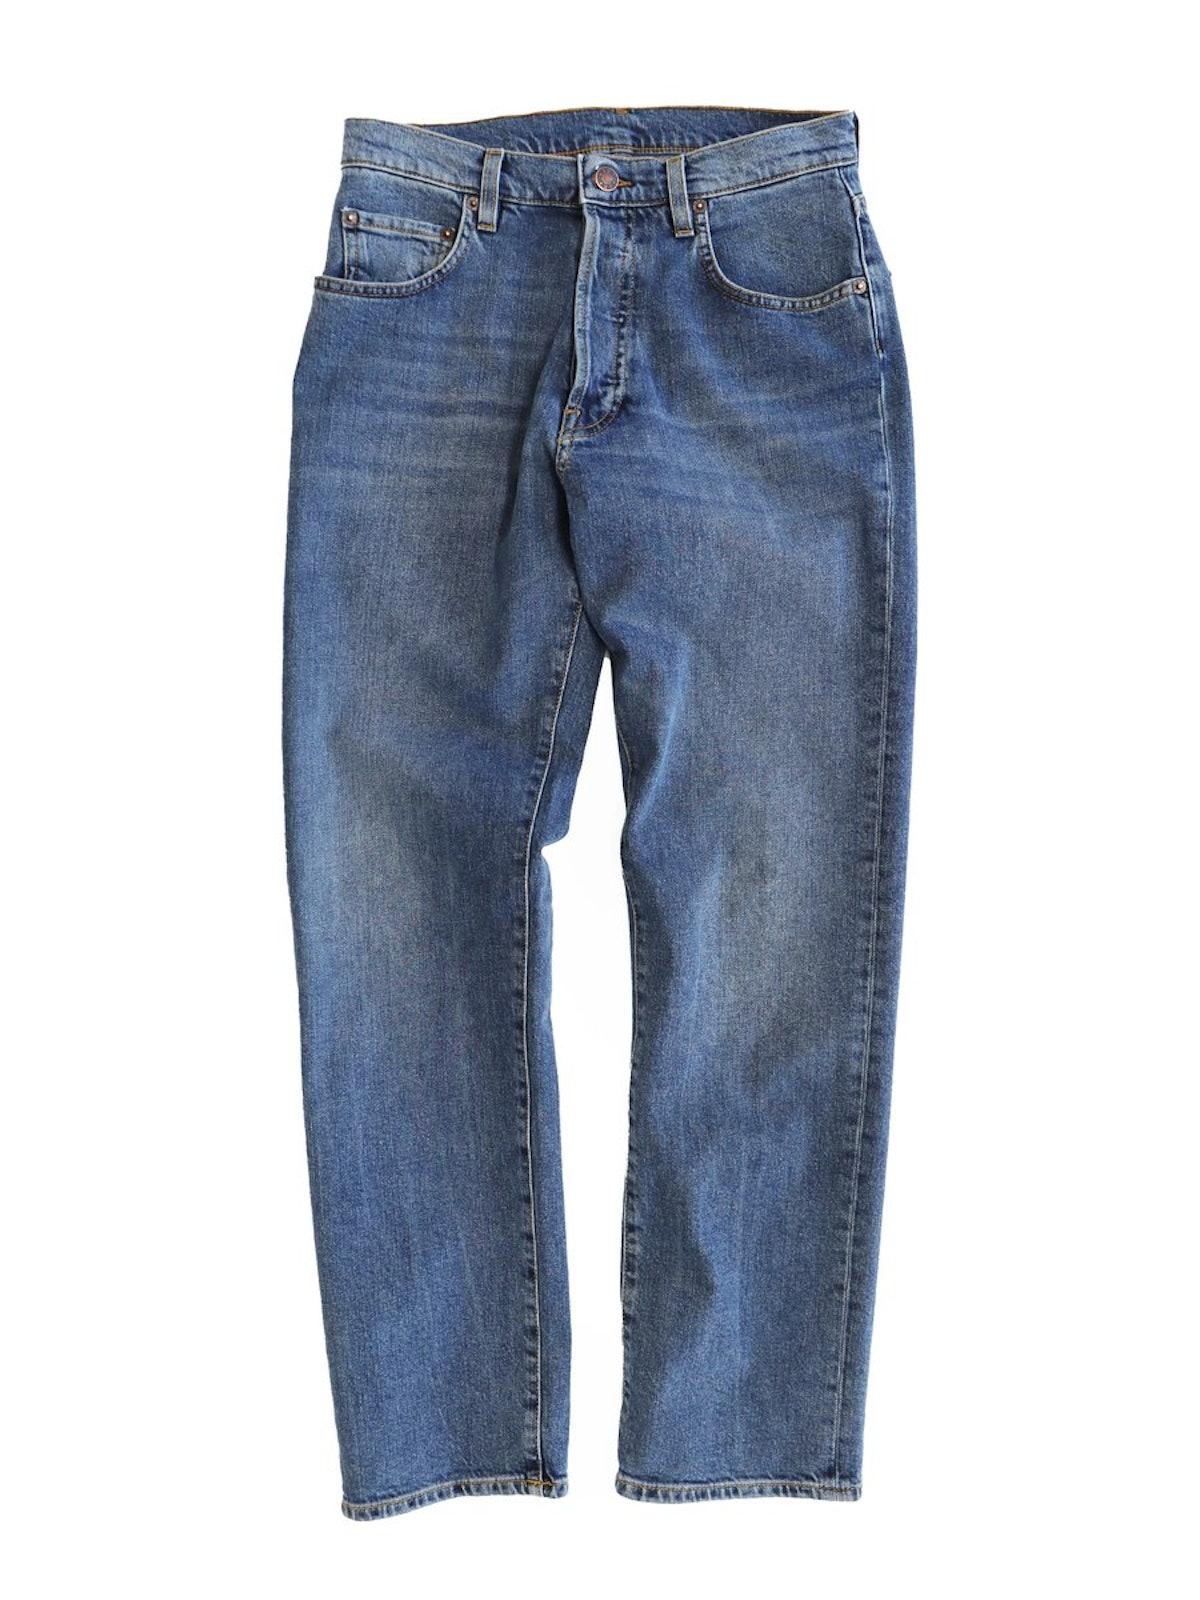 495 Jean in Clean Dark